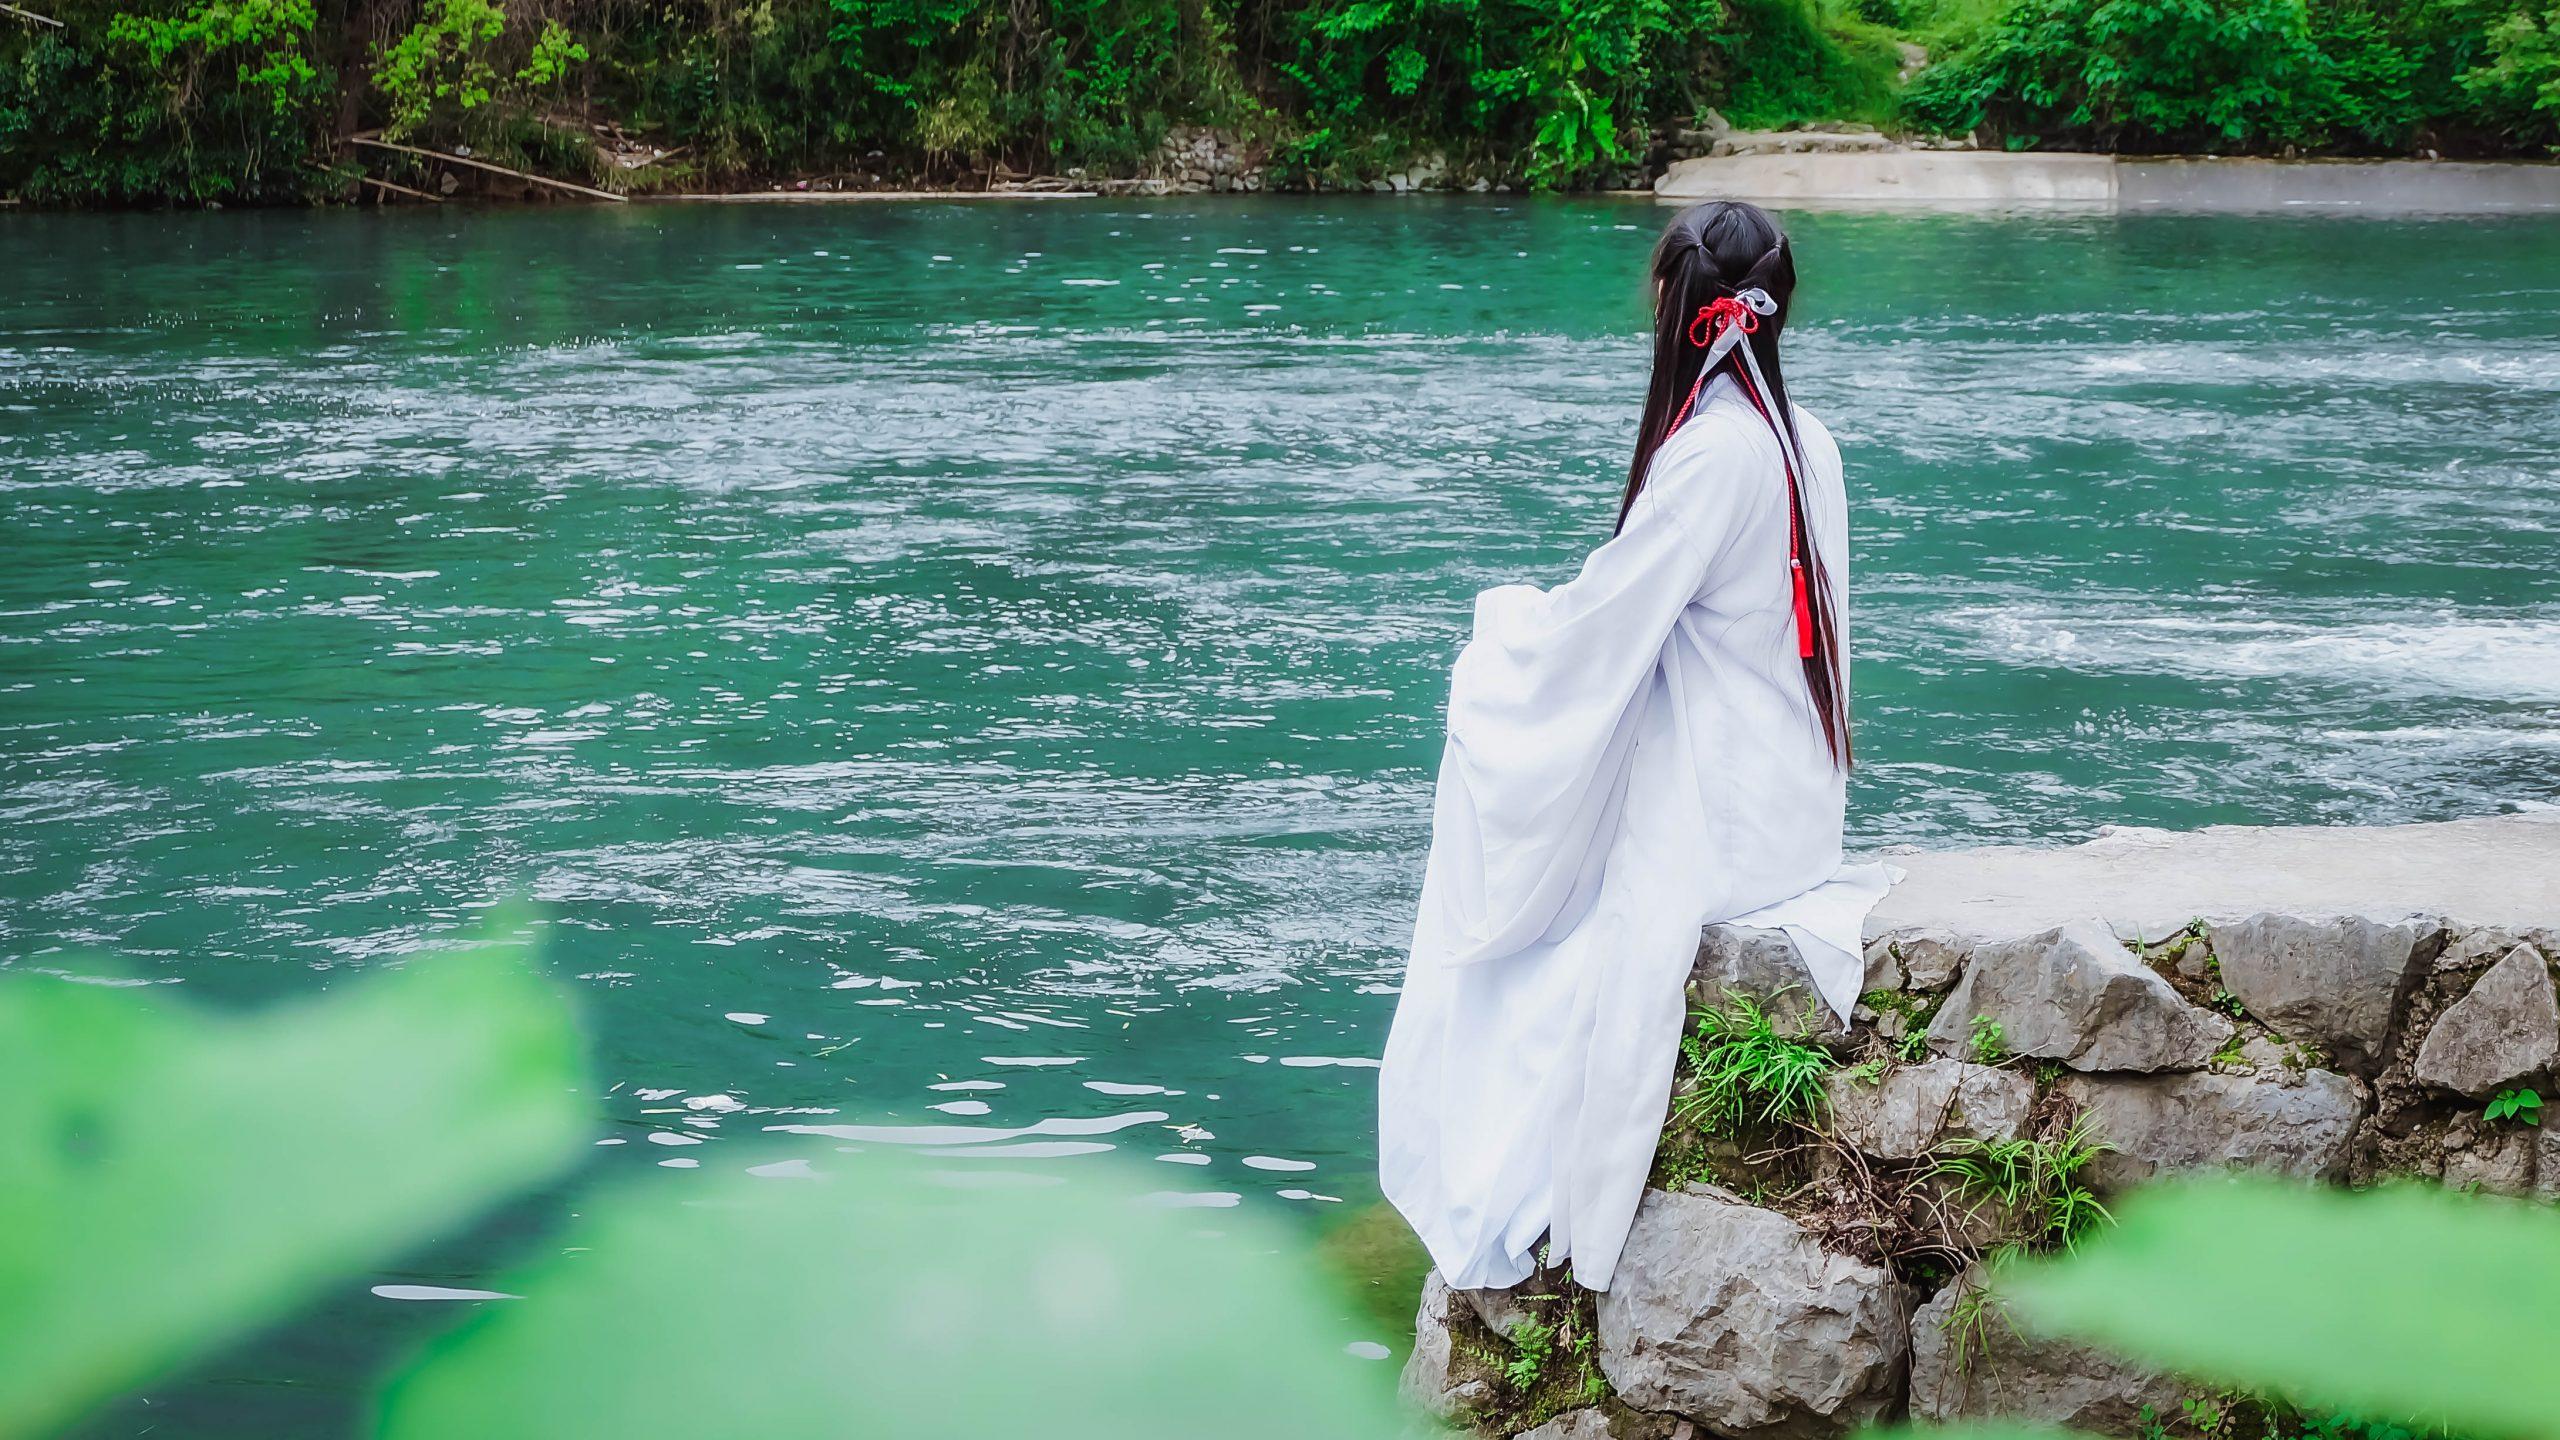 Hanfu: Beautiful, Elegant, Traditional Han Clothing of China